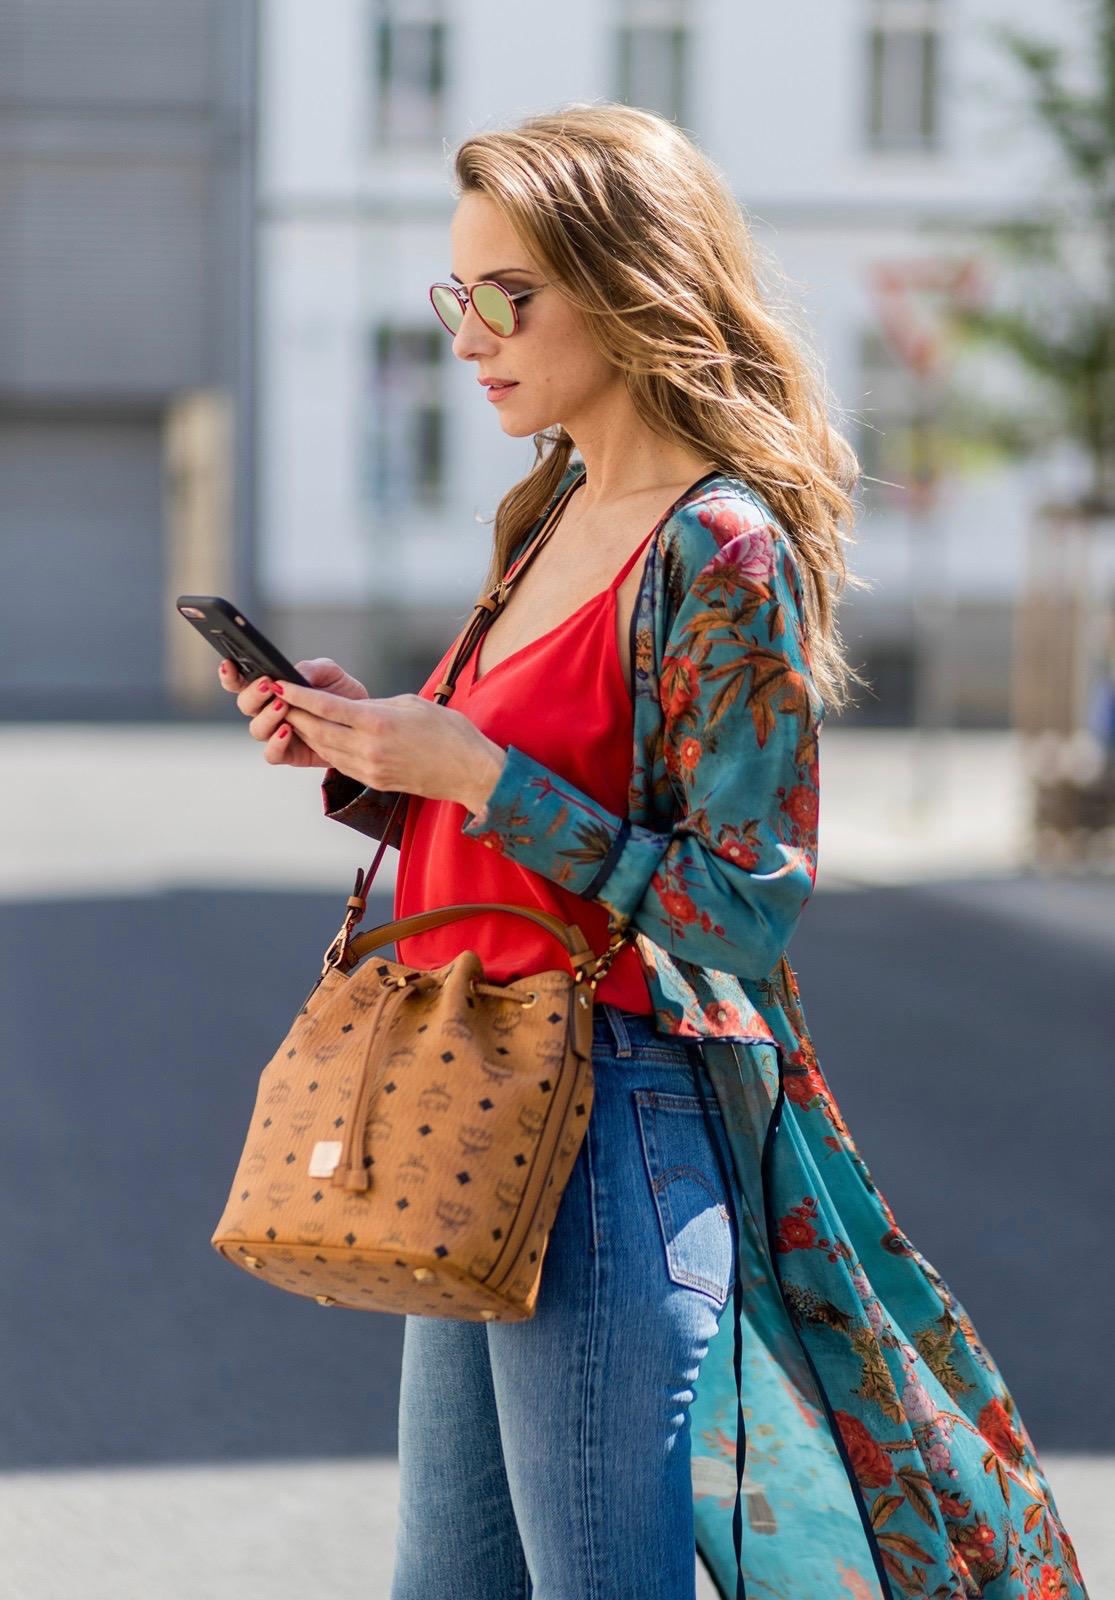 e6d0a3bc ... Model and fashion blogger Alexandra Lapp wearing a wrap dress in Kimono  style from Zara, ...